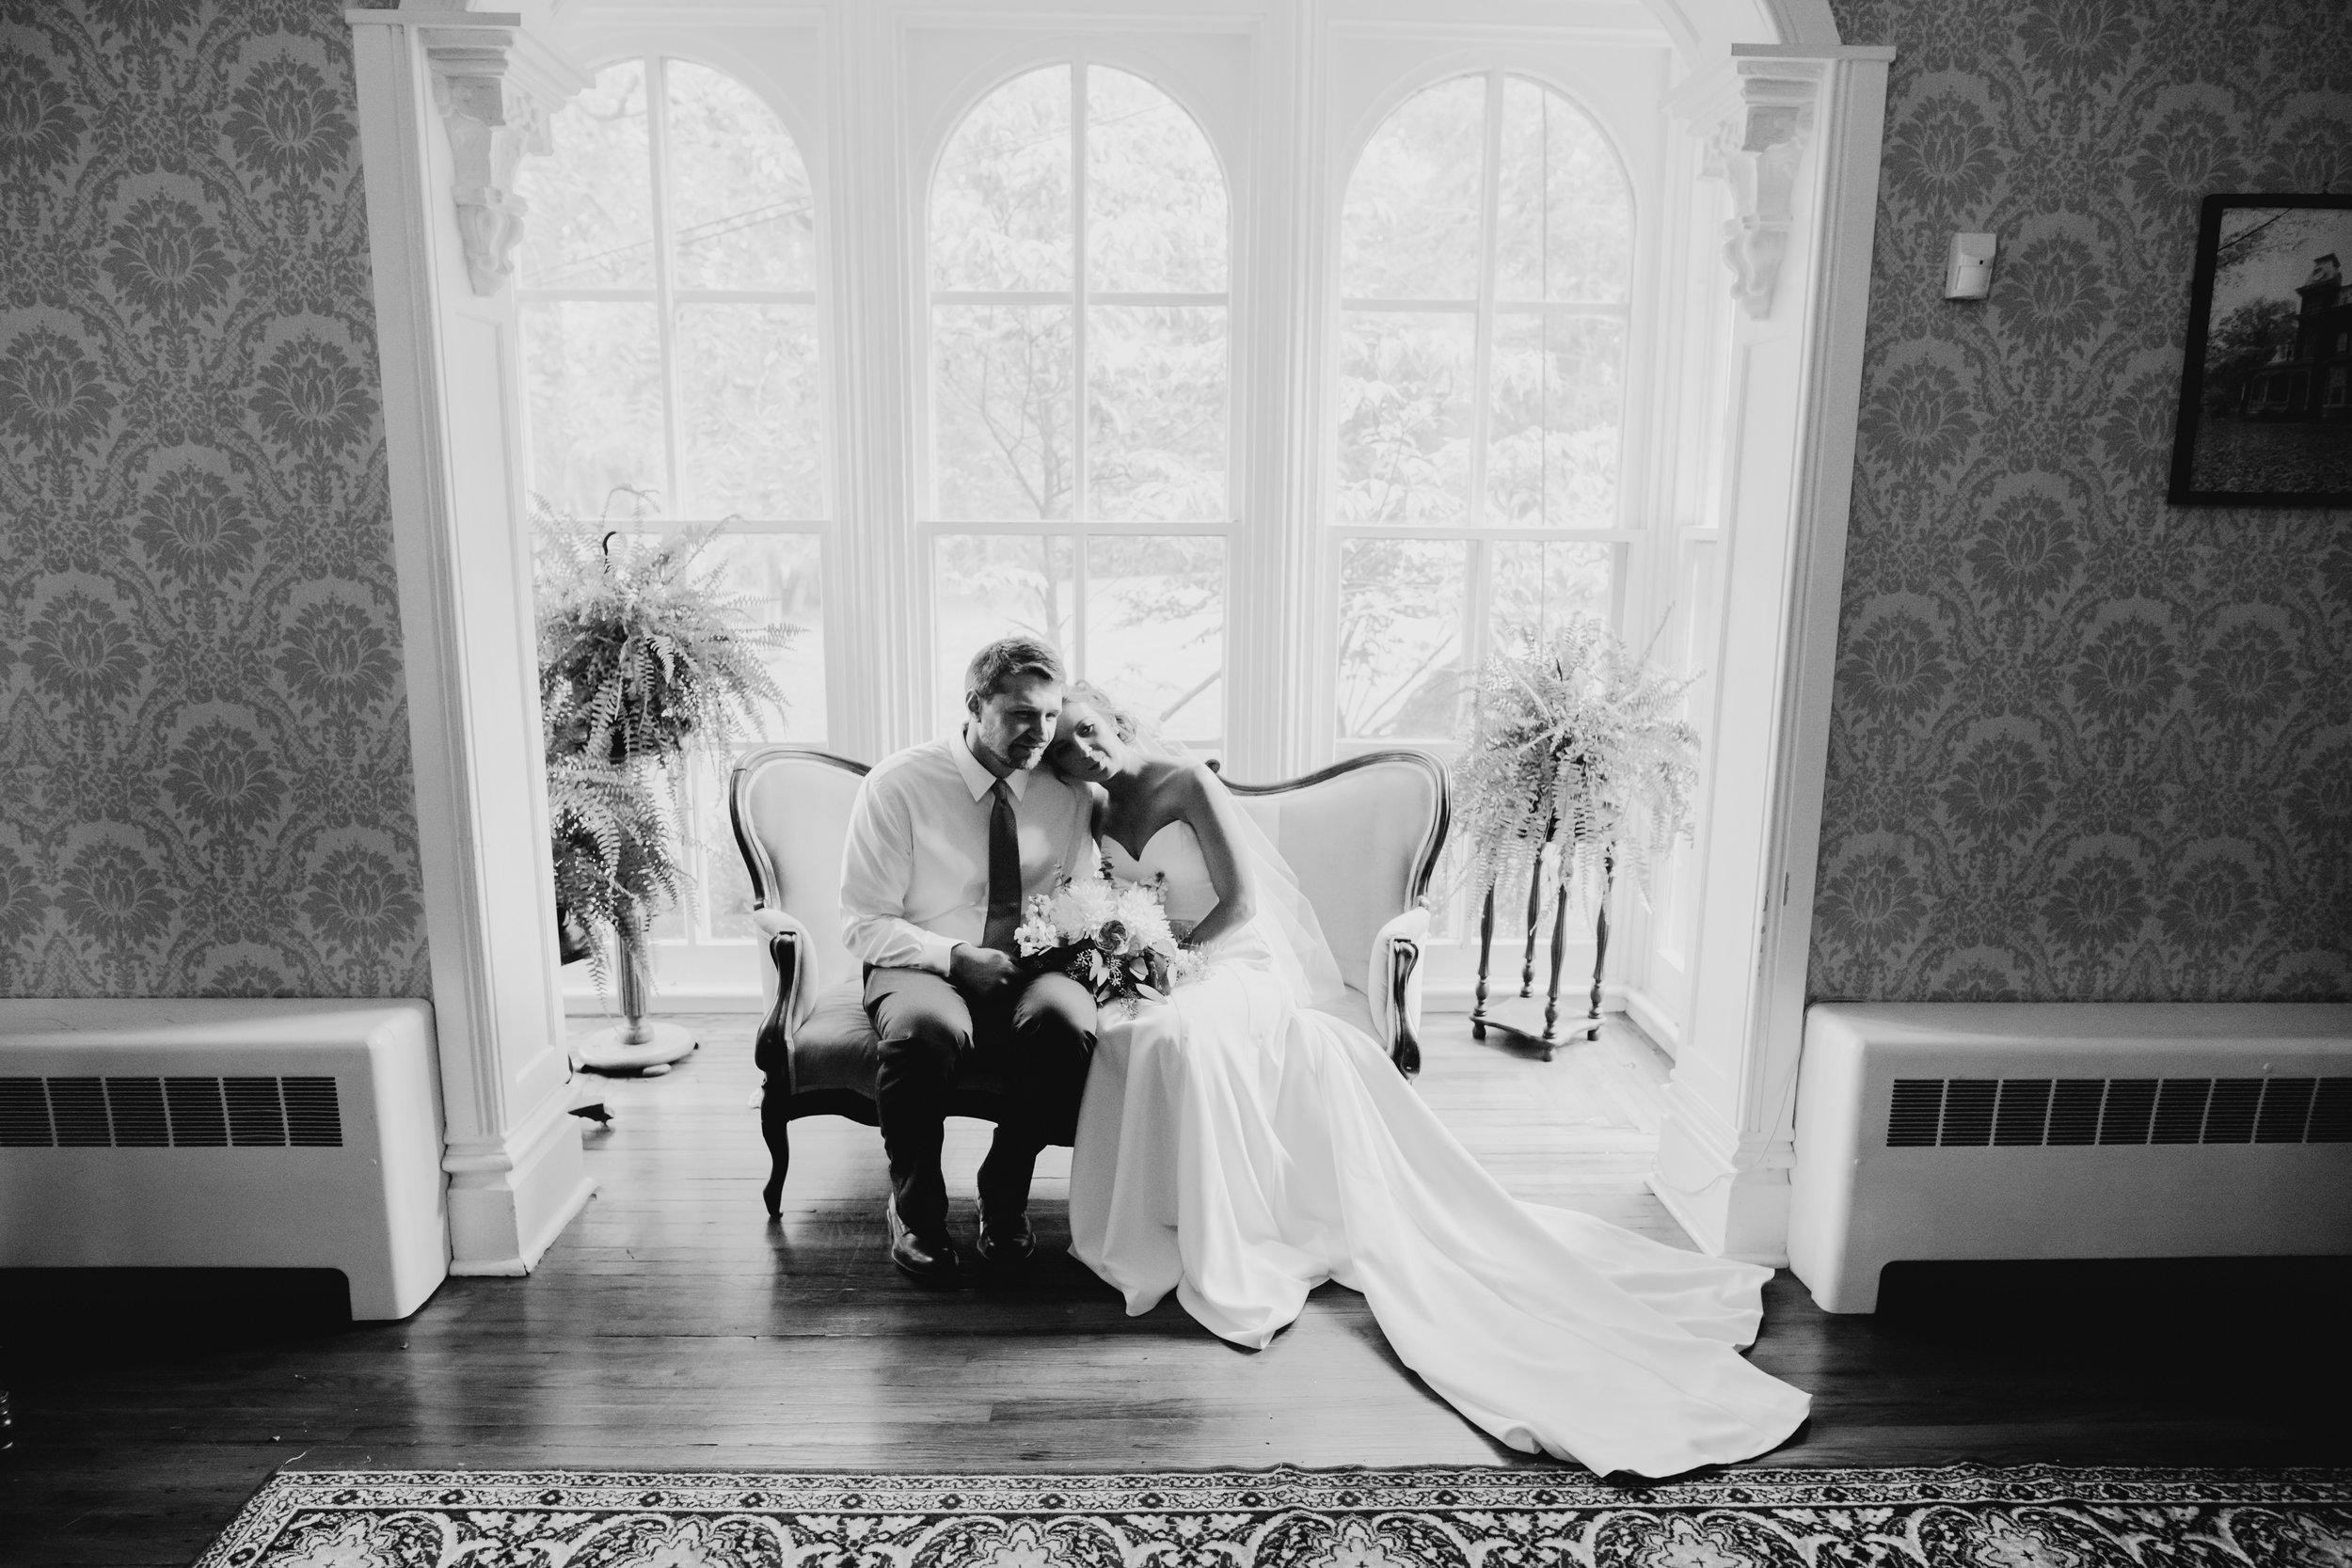 APD_chris_justin_wedding-156 copy.jpg